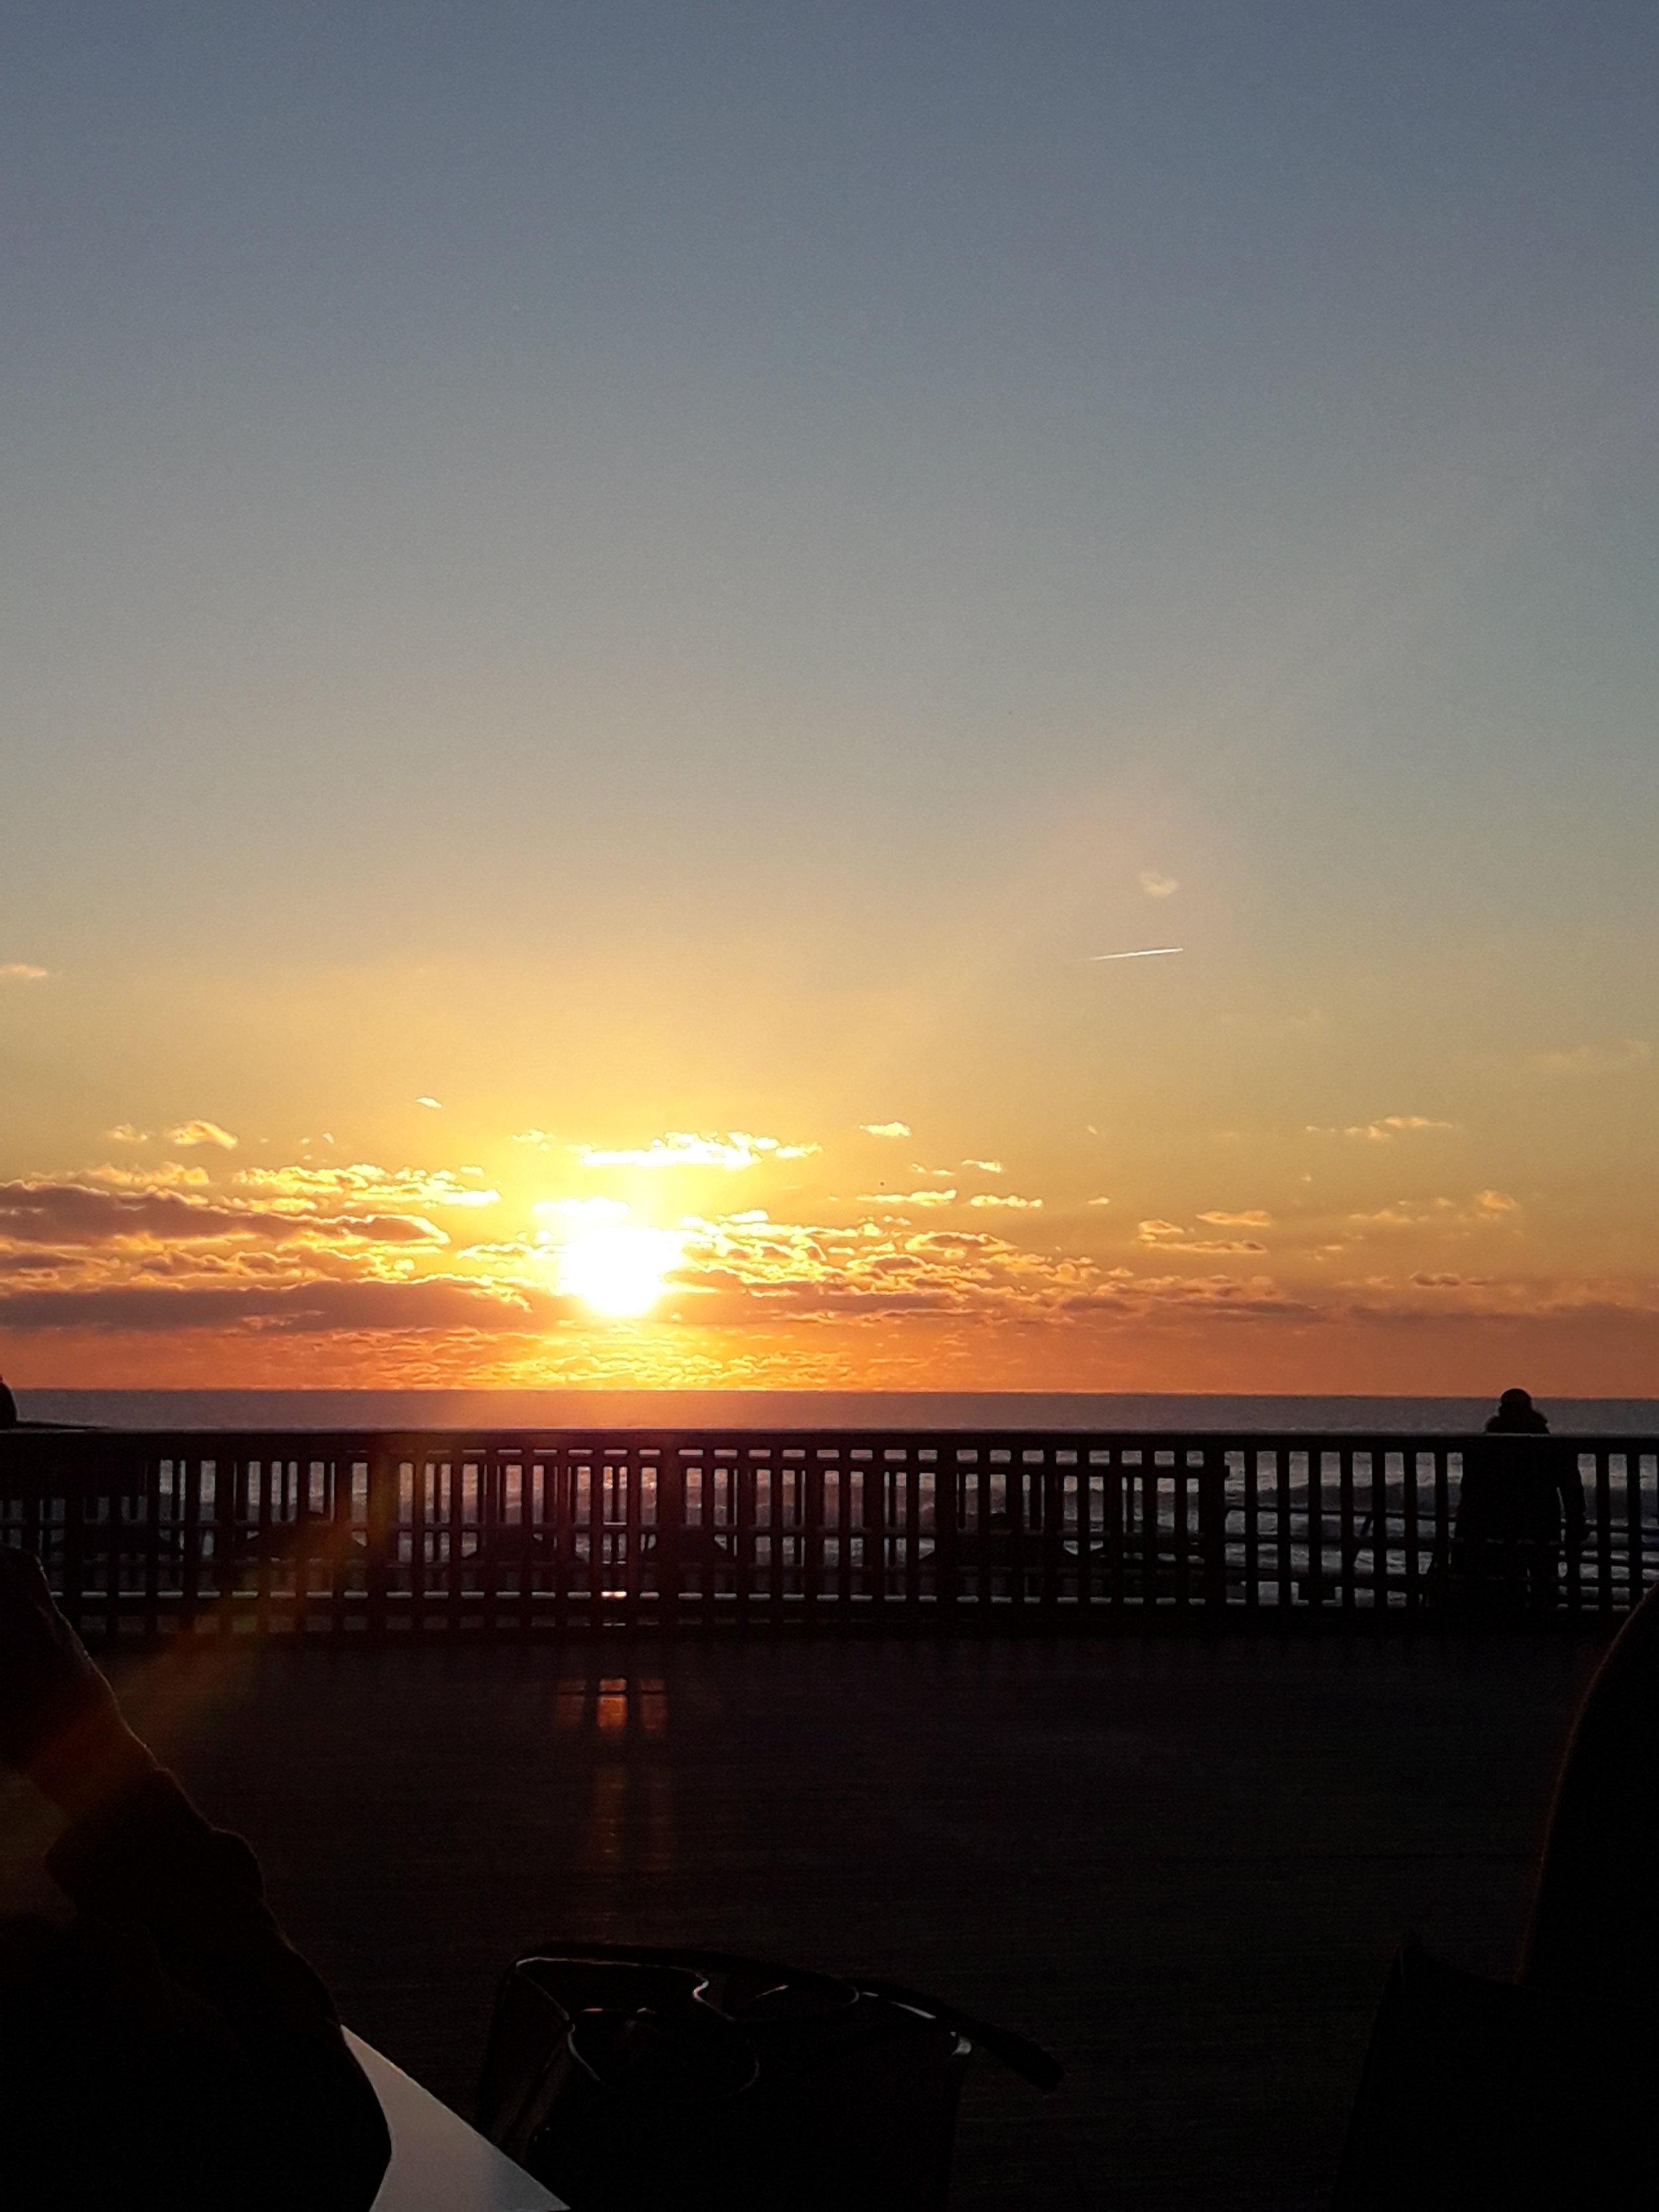 Sonnenuntergang-Ericeria-Portugal.jpg